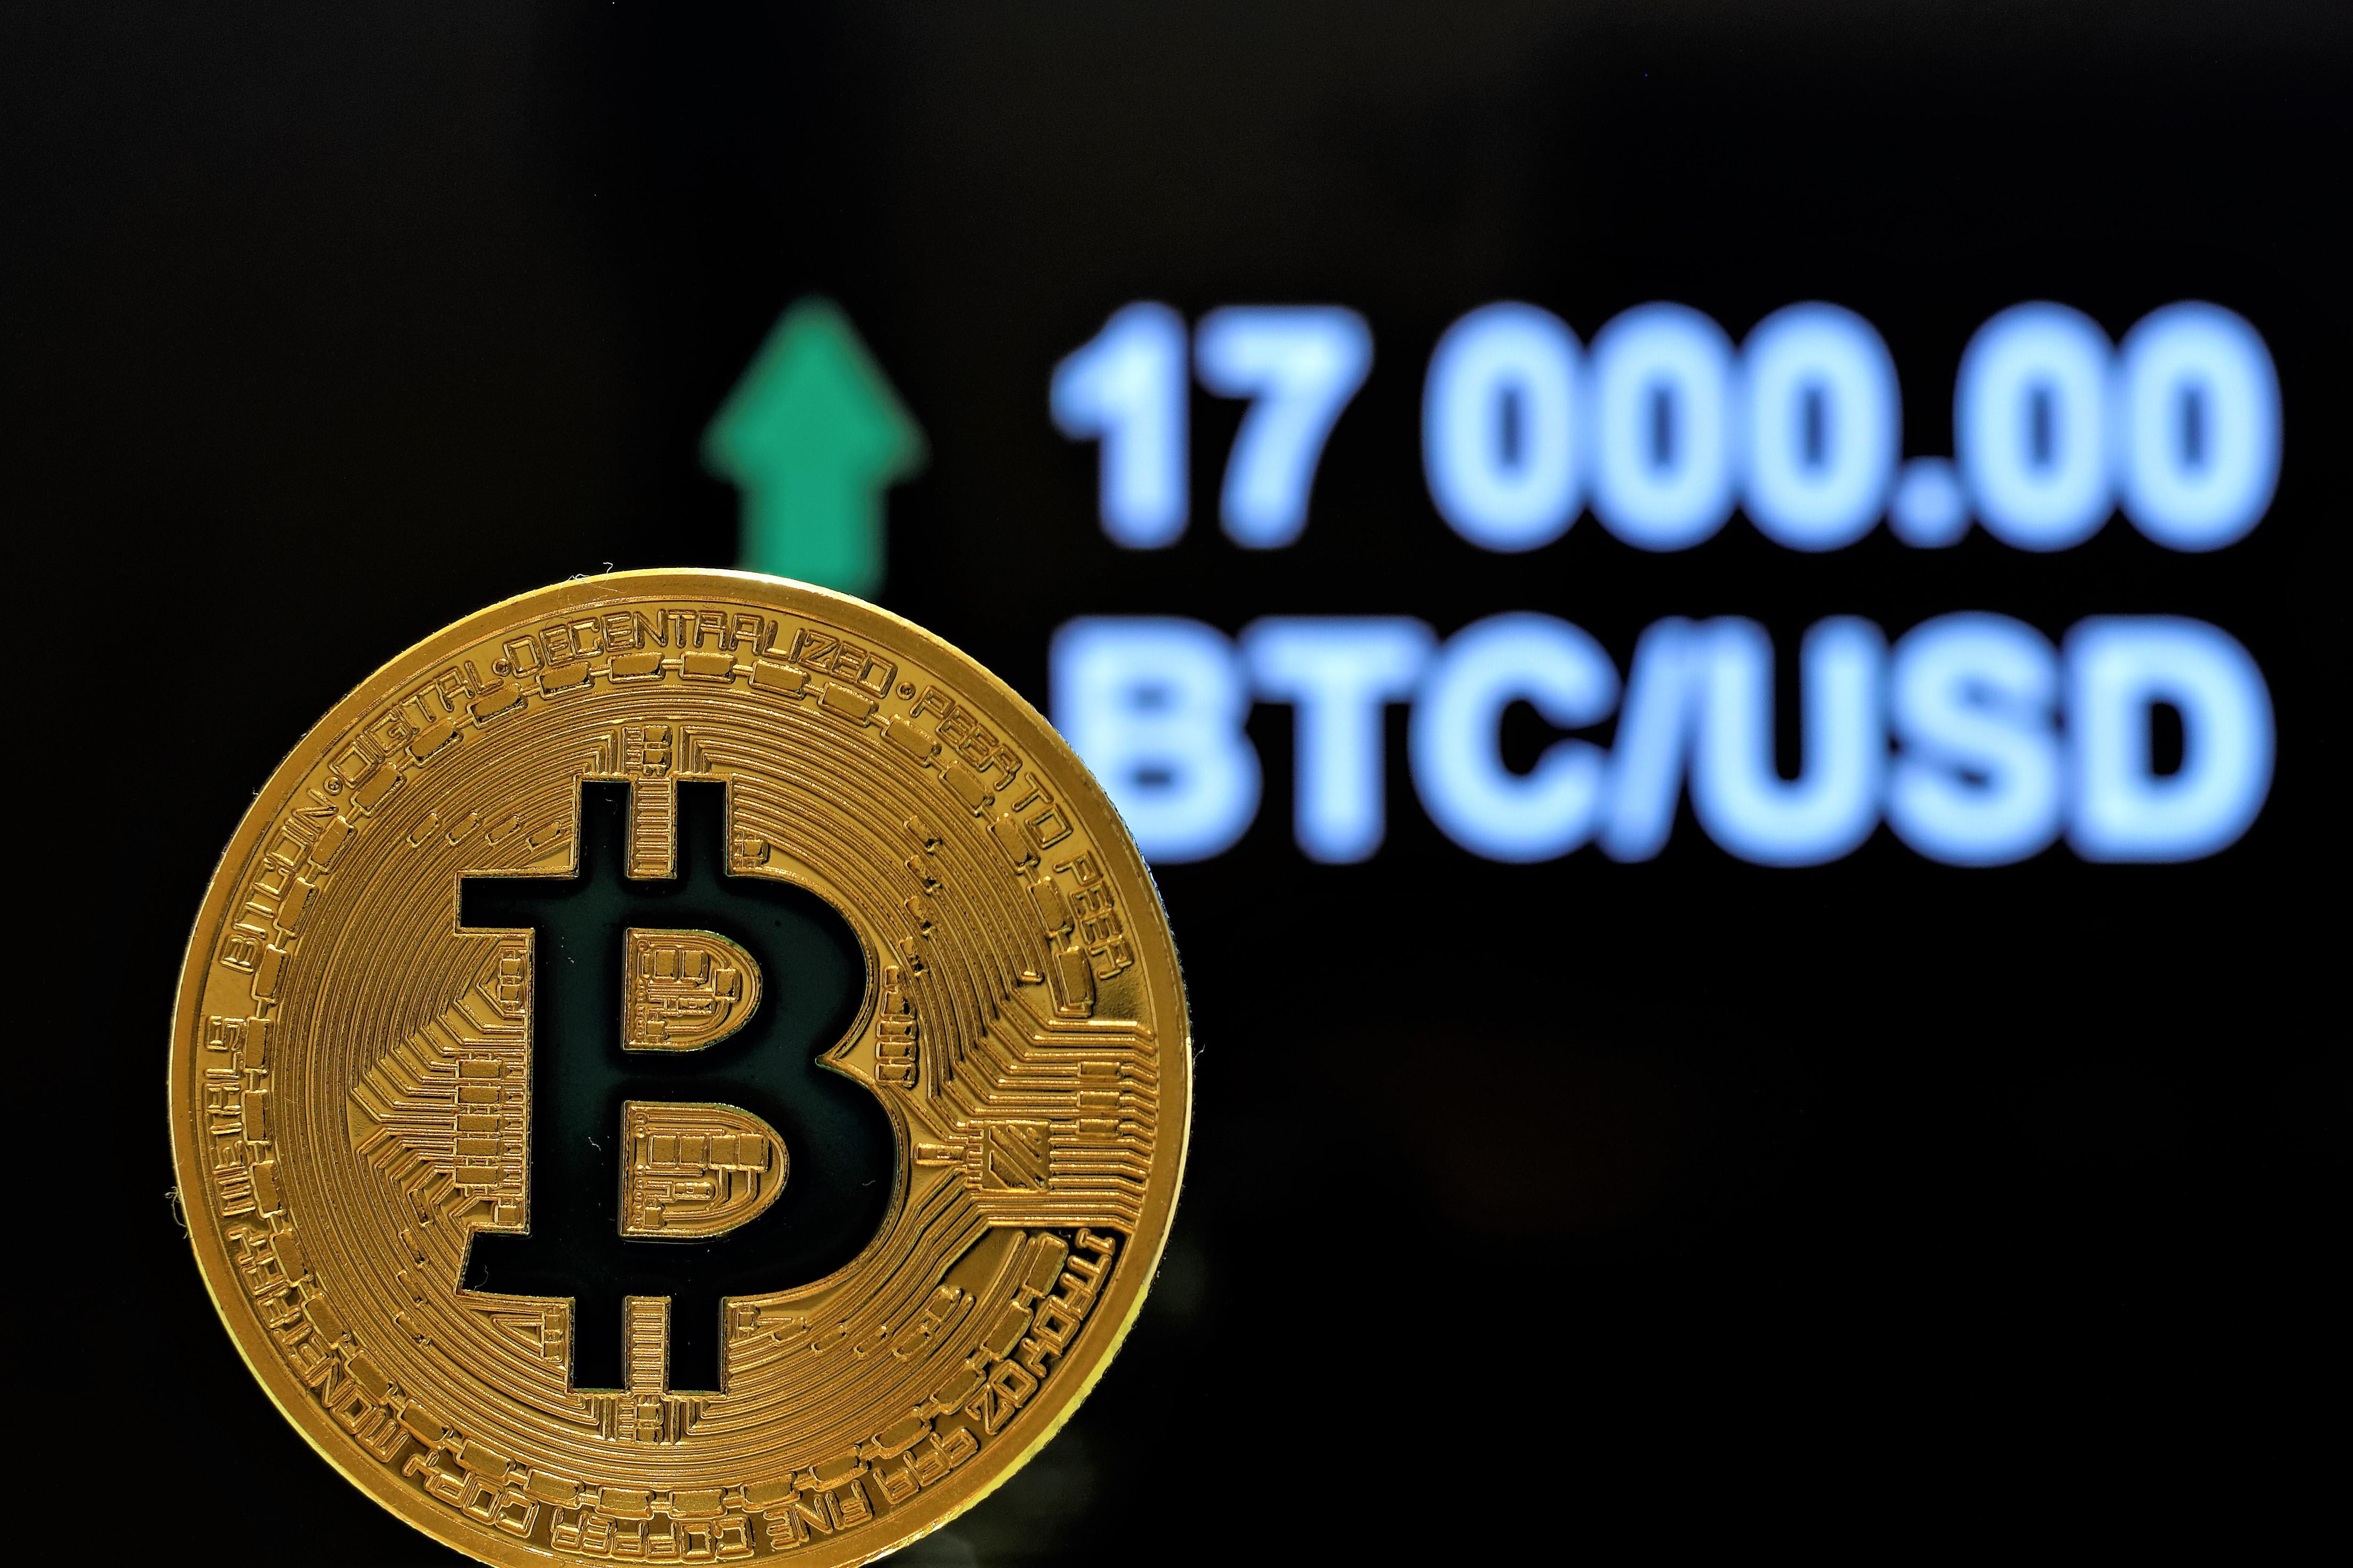 17000 bitcoins to dollars